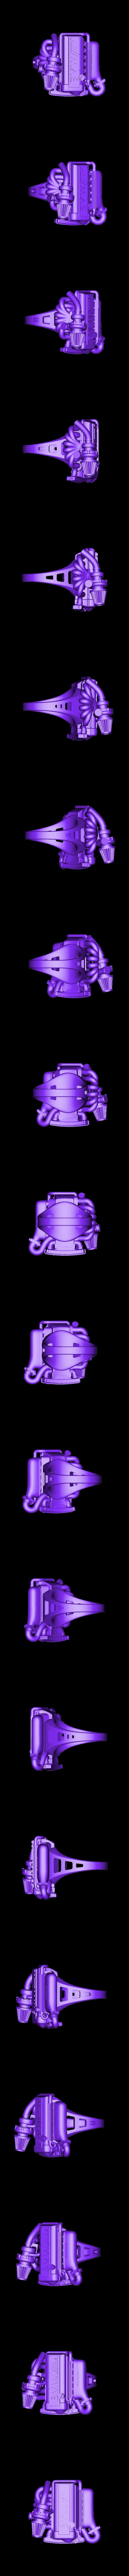 BMW ring engine ring mator ring.obj Télécharger fichier OBJ gratuit BMW ring moteur ring mator ring • Design pour imprimante 3D, Cadagency